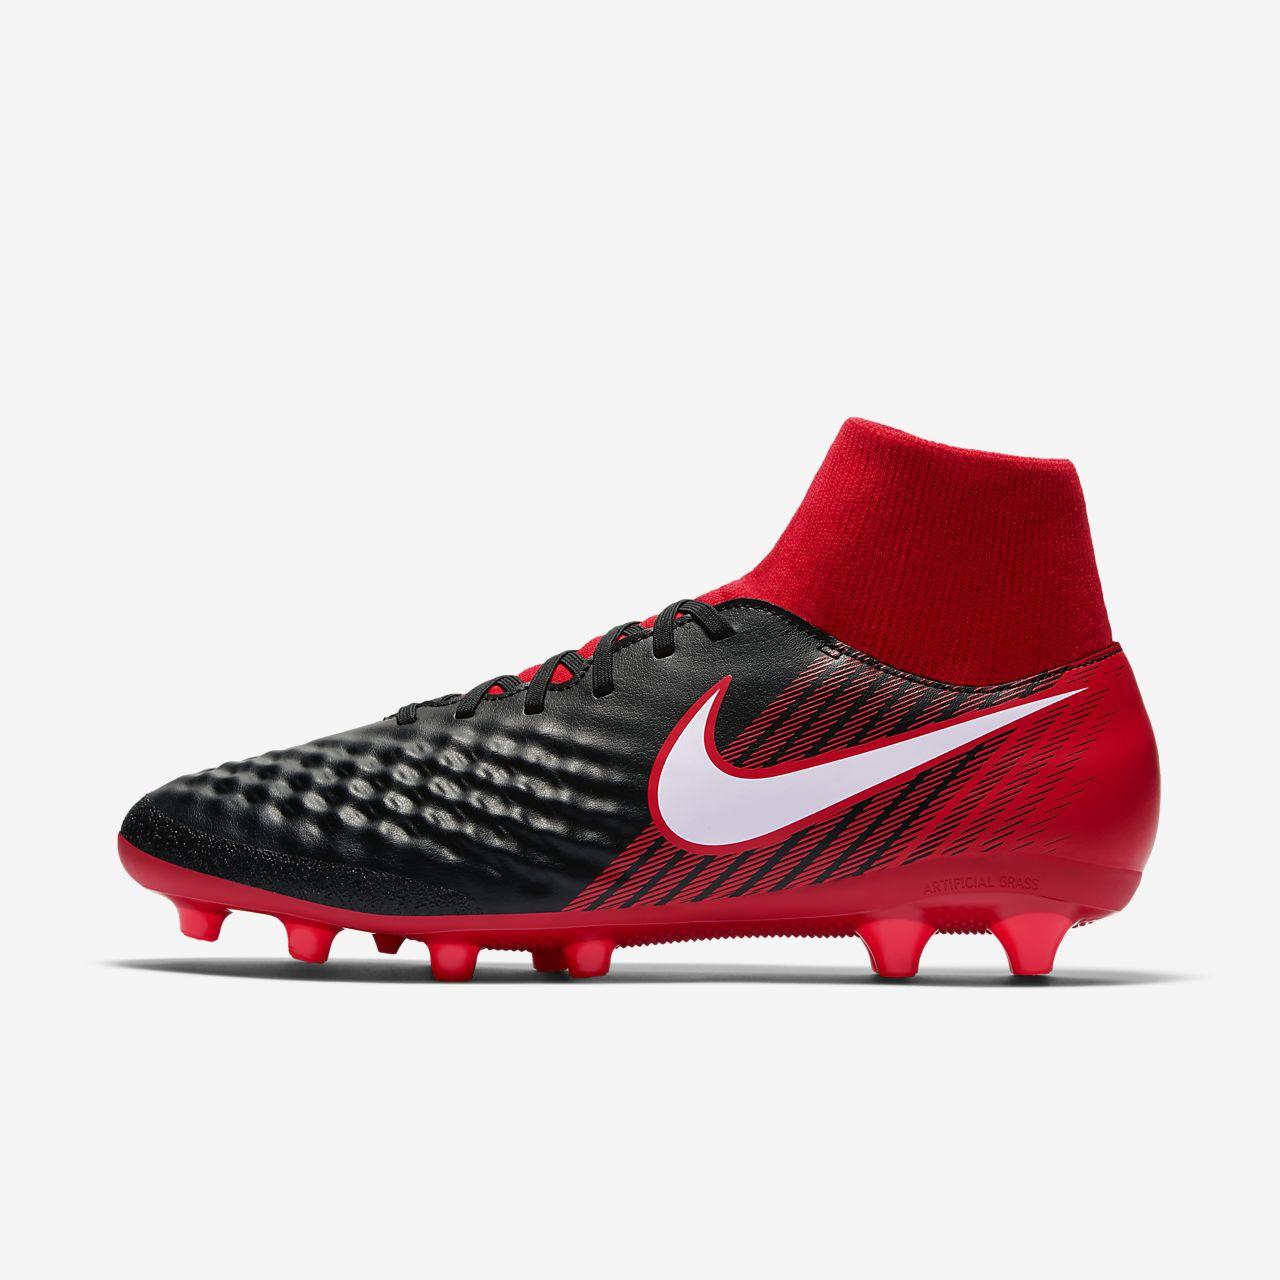 ... Nike Magista Onda II Dynamic Fit AG-PRO Artificial-Grass Football Boot